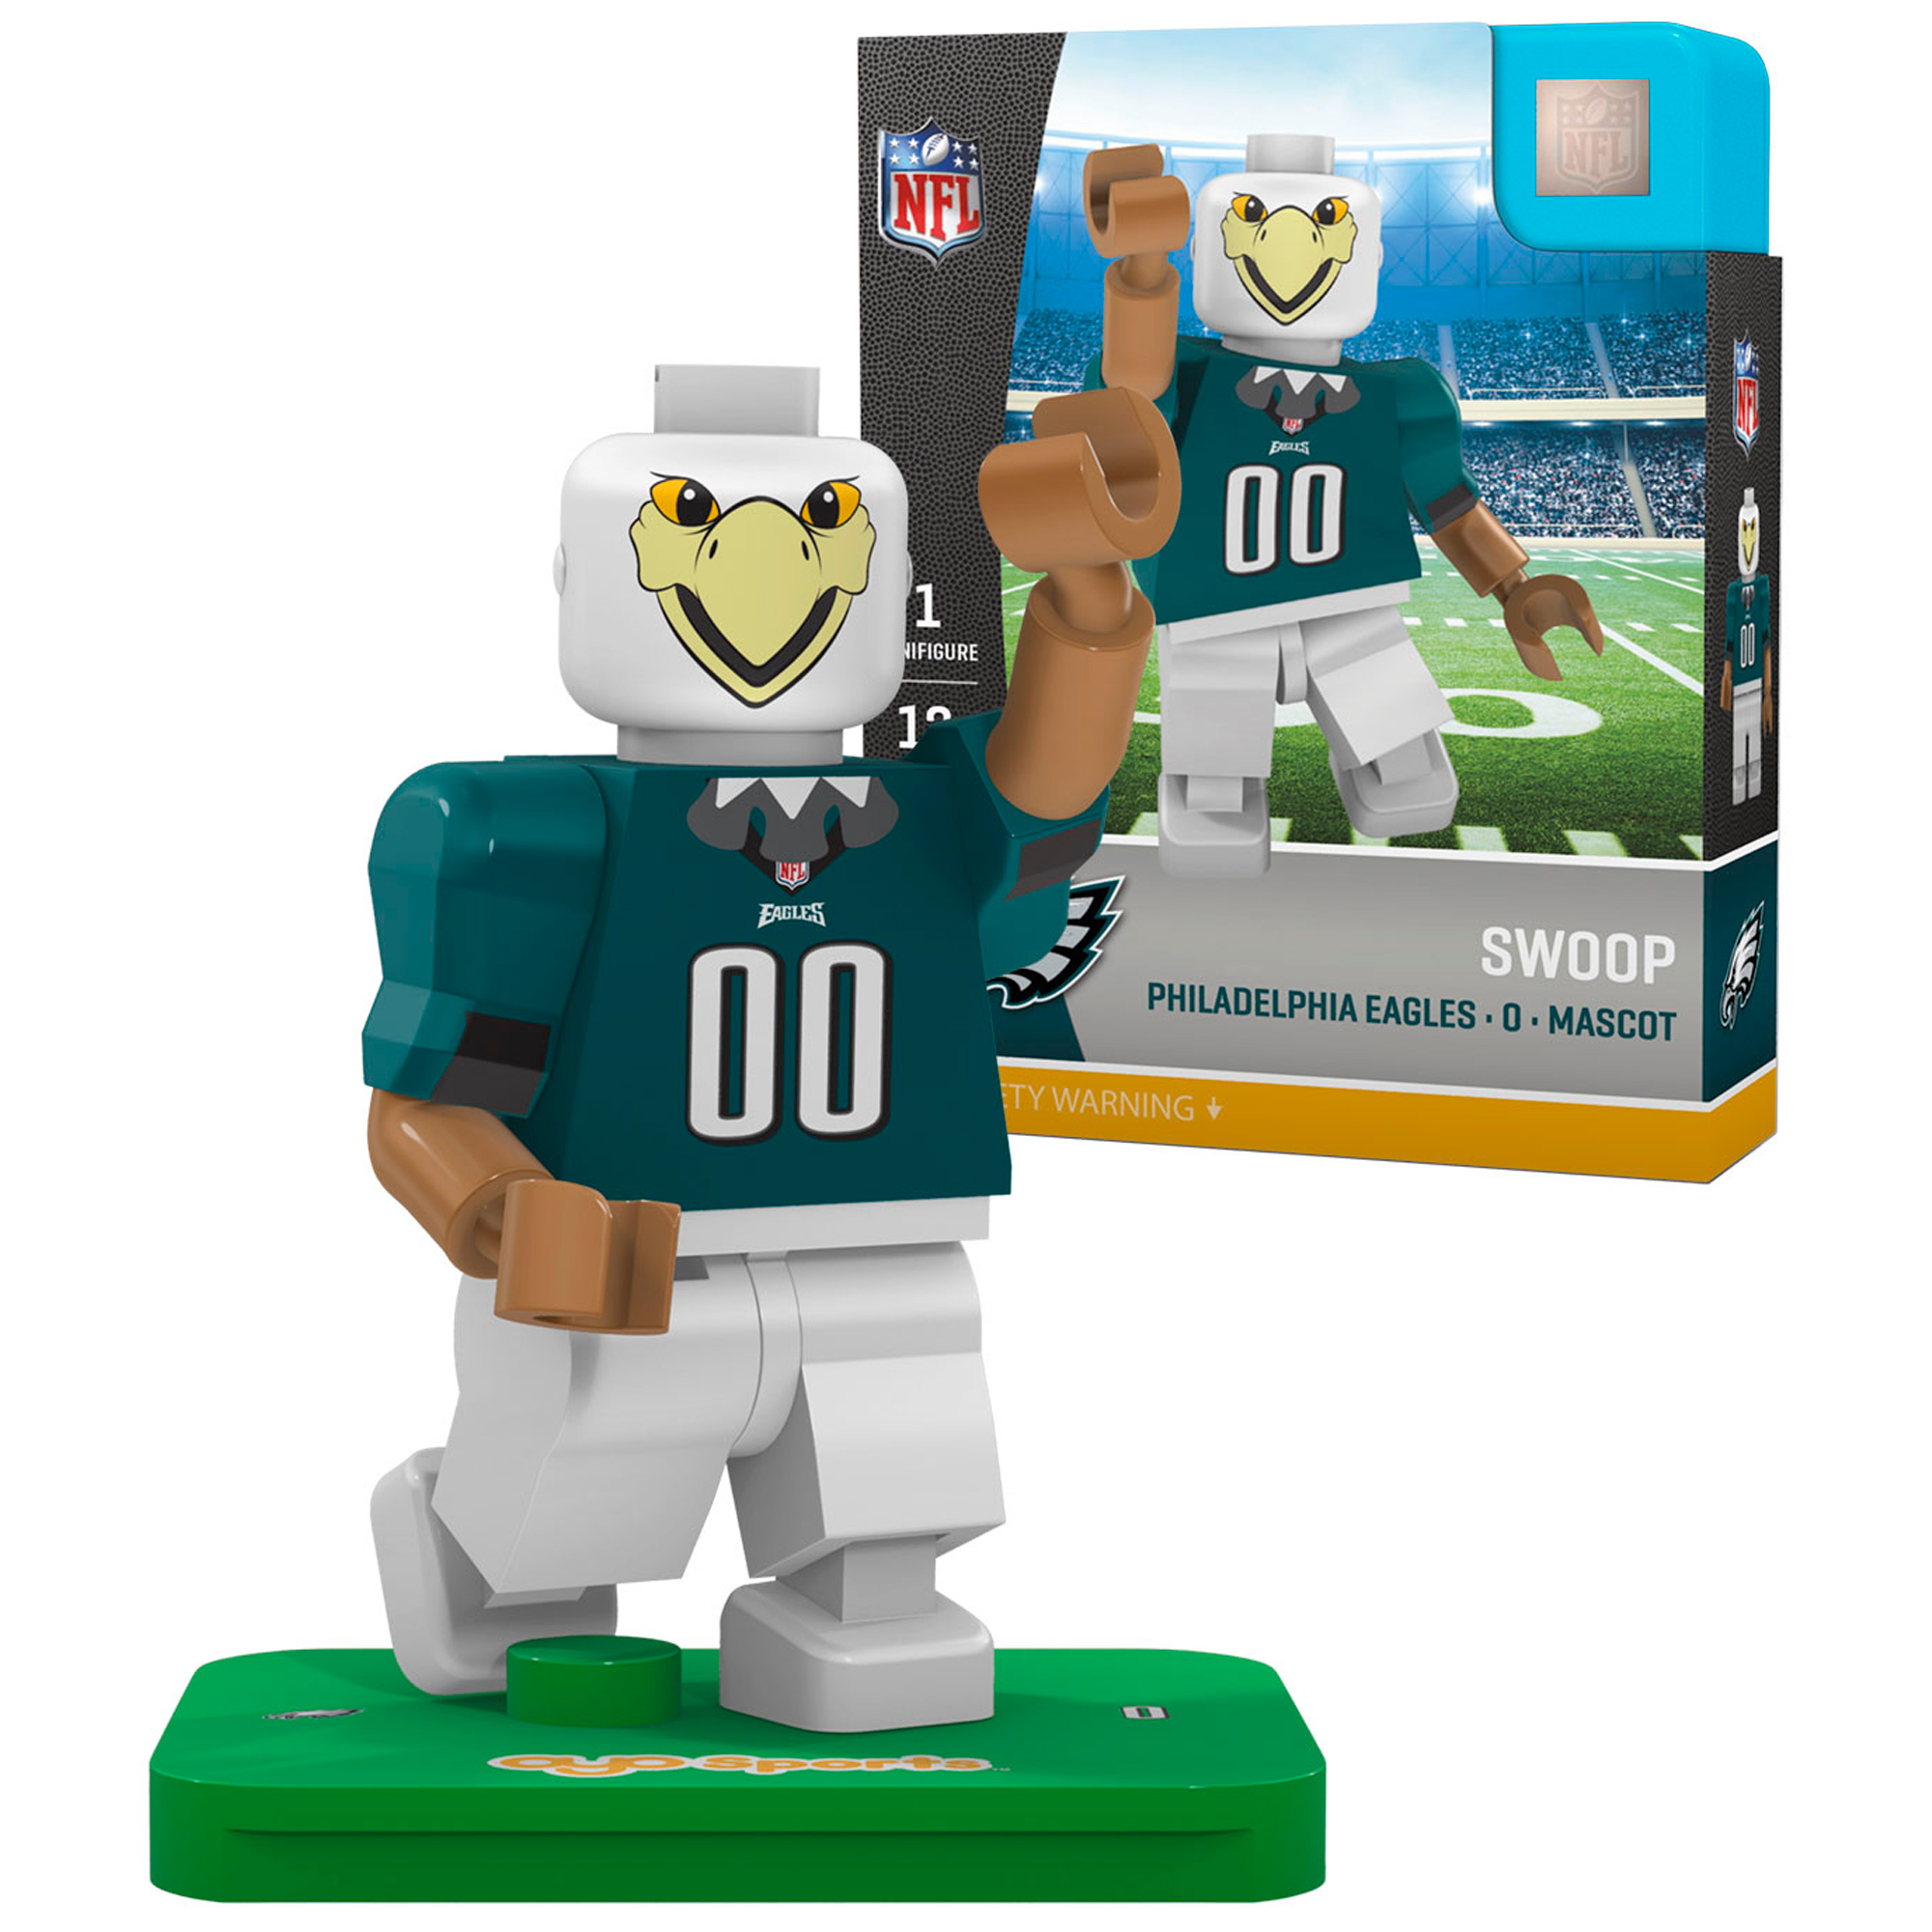 Swoop Philadelphia Eagles Oyo Sports Generation 5 Mascot Minifigure